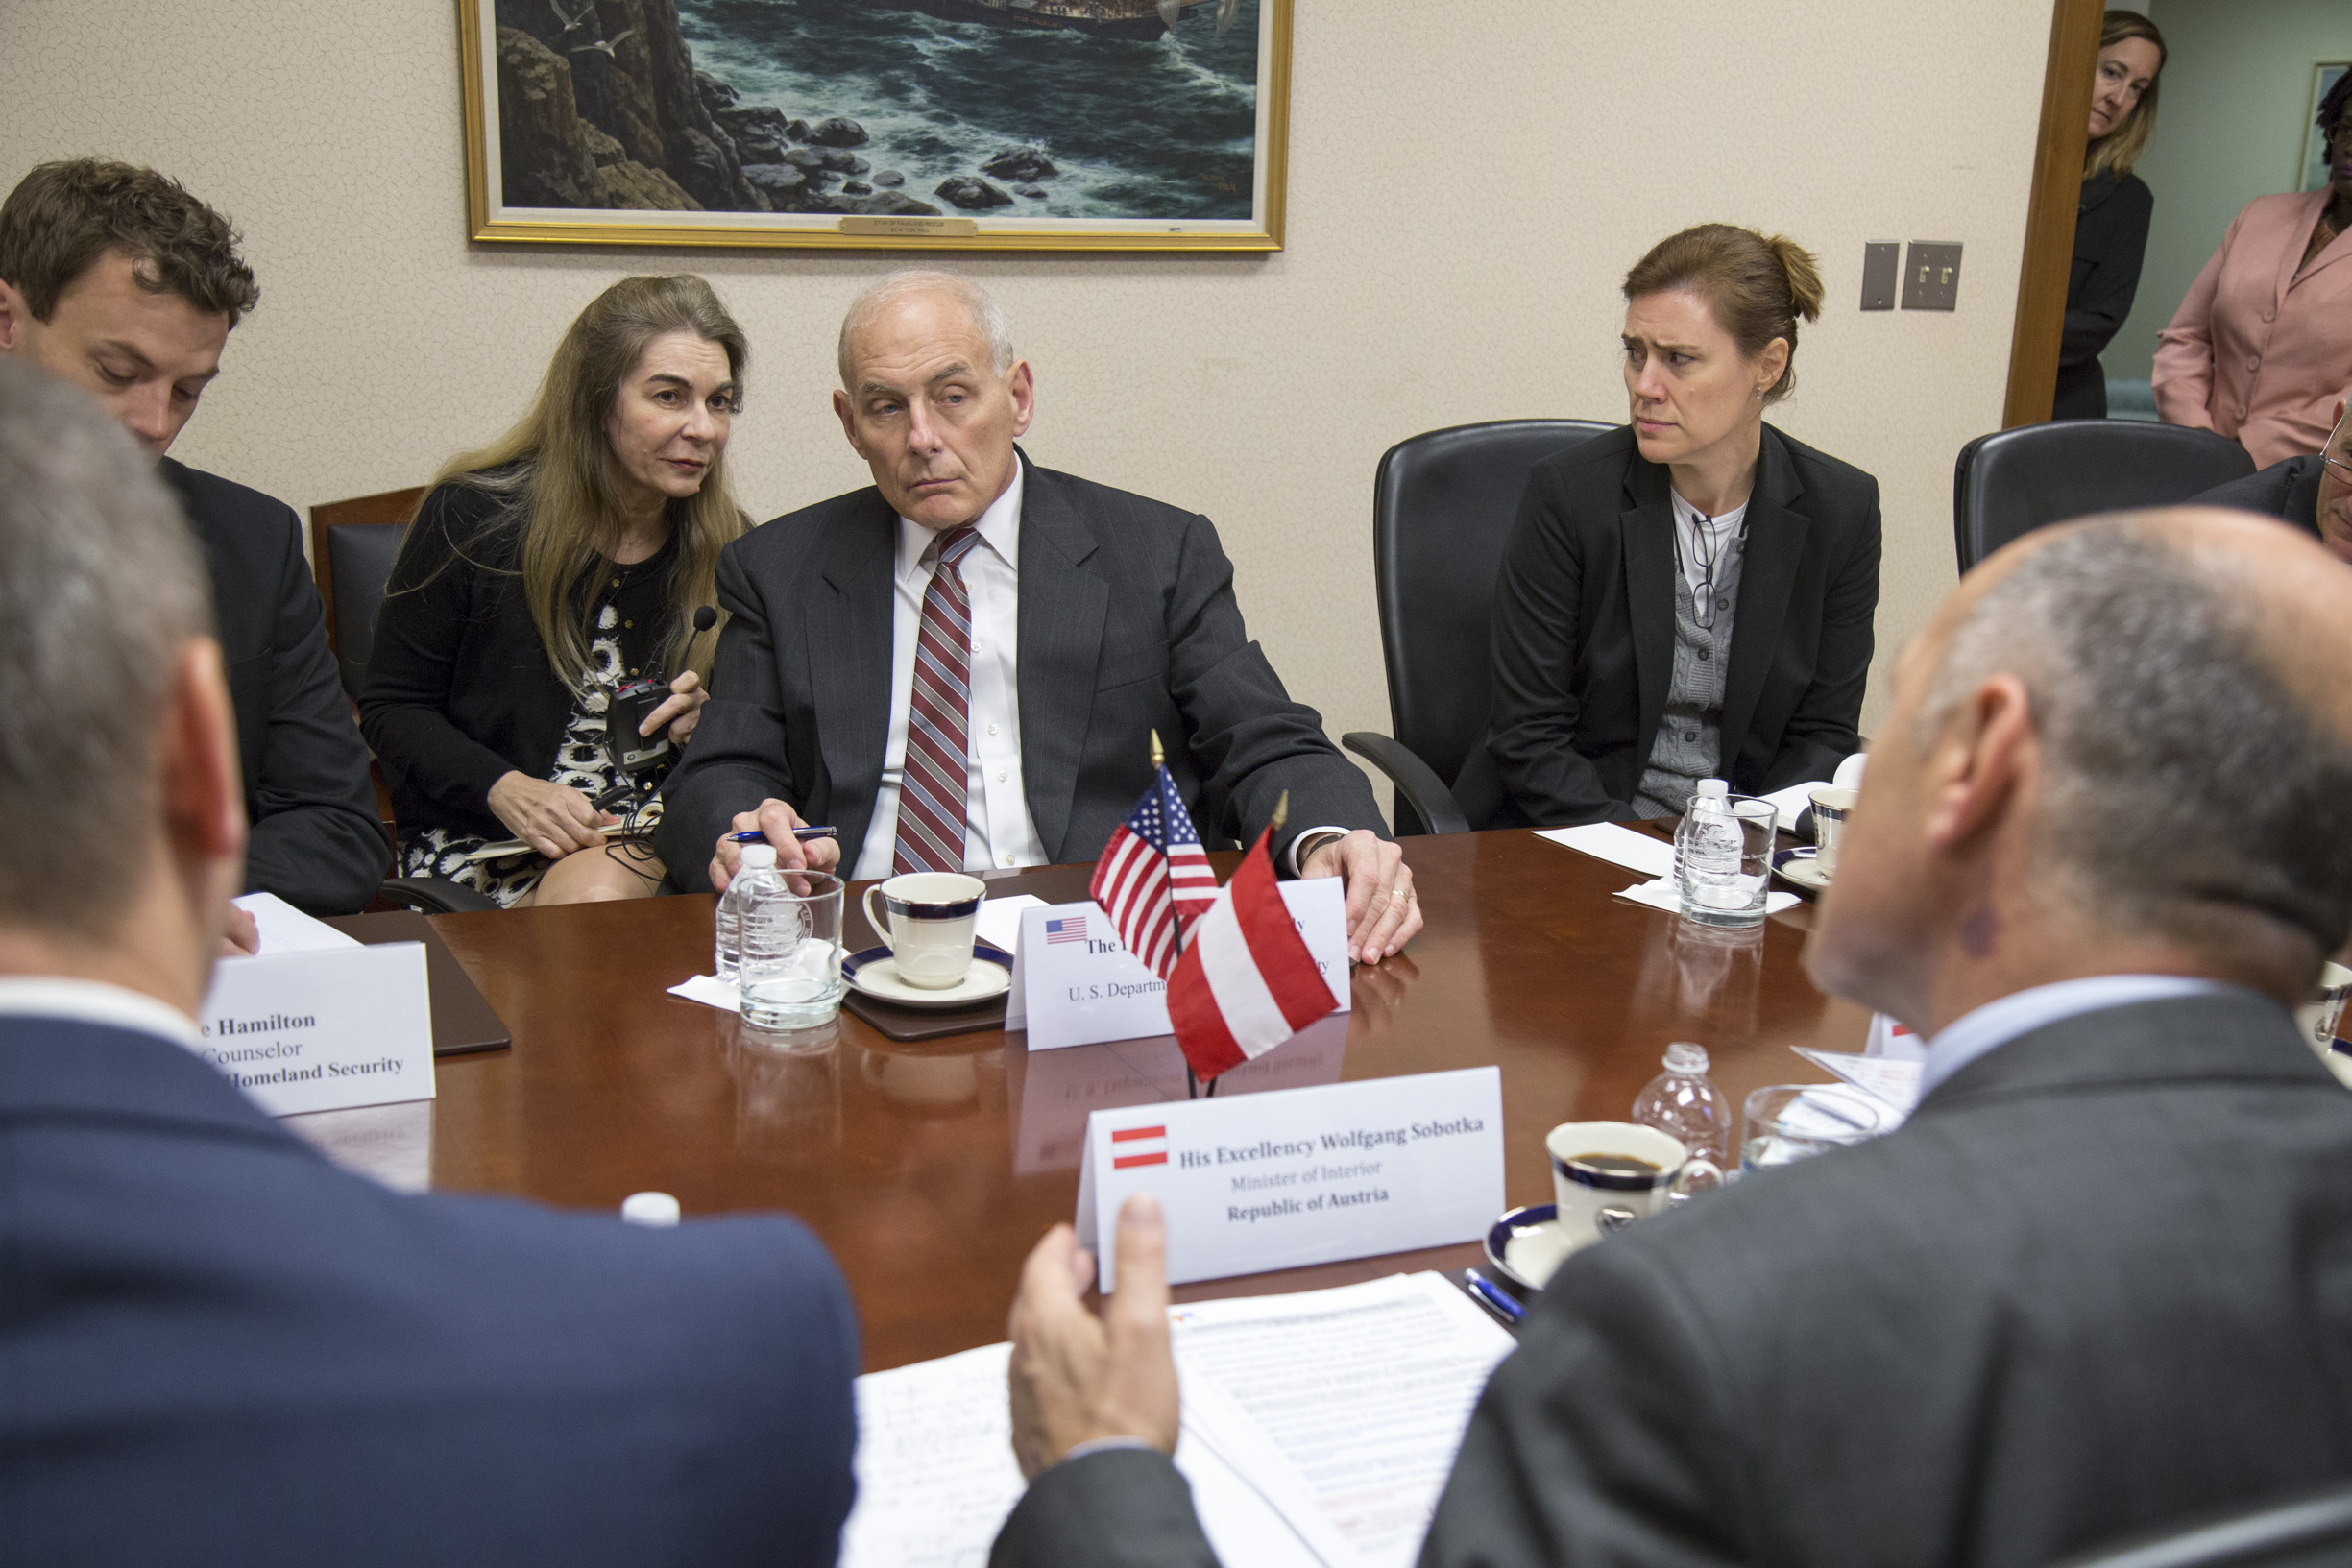 "Federal Minister Sobotka and delegation meet U.S. Secretary John Kelly.         96              Normal   0           false   false   false     EN-US   X-NONE   X-NONE                                                                                                                                                                                                                                                                                                                                                                                                                                                                                                                                                                                                                                                                                                                                                                                                                                                                                     /* Style Definitions */ table.MsoNormalTable {mso-style-name:""Table Normal""; mso-tstyle-rowband-size:0; mso-tstyle-colband-size:0; mso-style-noshow:yes; mso-style-priority:99; mso-style-parent:""""; mso-padding-alt:0in 5.4pt 0in 5.4pt; mso-para-margin:0in; mso-para-margin-bottom:.0001pt; mso-pagination:widow-orphan; font-size:12.0pt; font-family:Calibri; mso-ascii-font-family:Calibri; mso-ascii-theme-font:minor-latin; mso-hansi-font-family:Calibri; mso-hansi-theme-font:minor-latin;}      Photo: BMI/ Jürgen Makowecz"